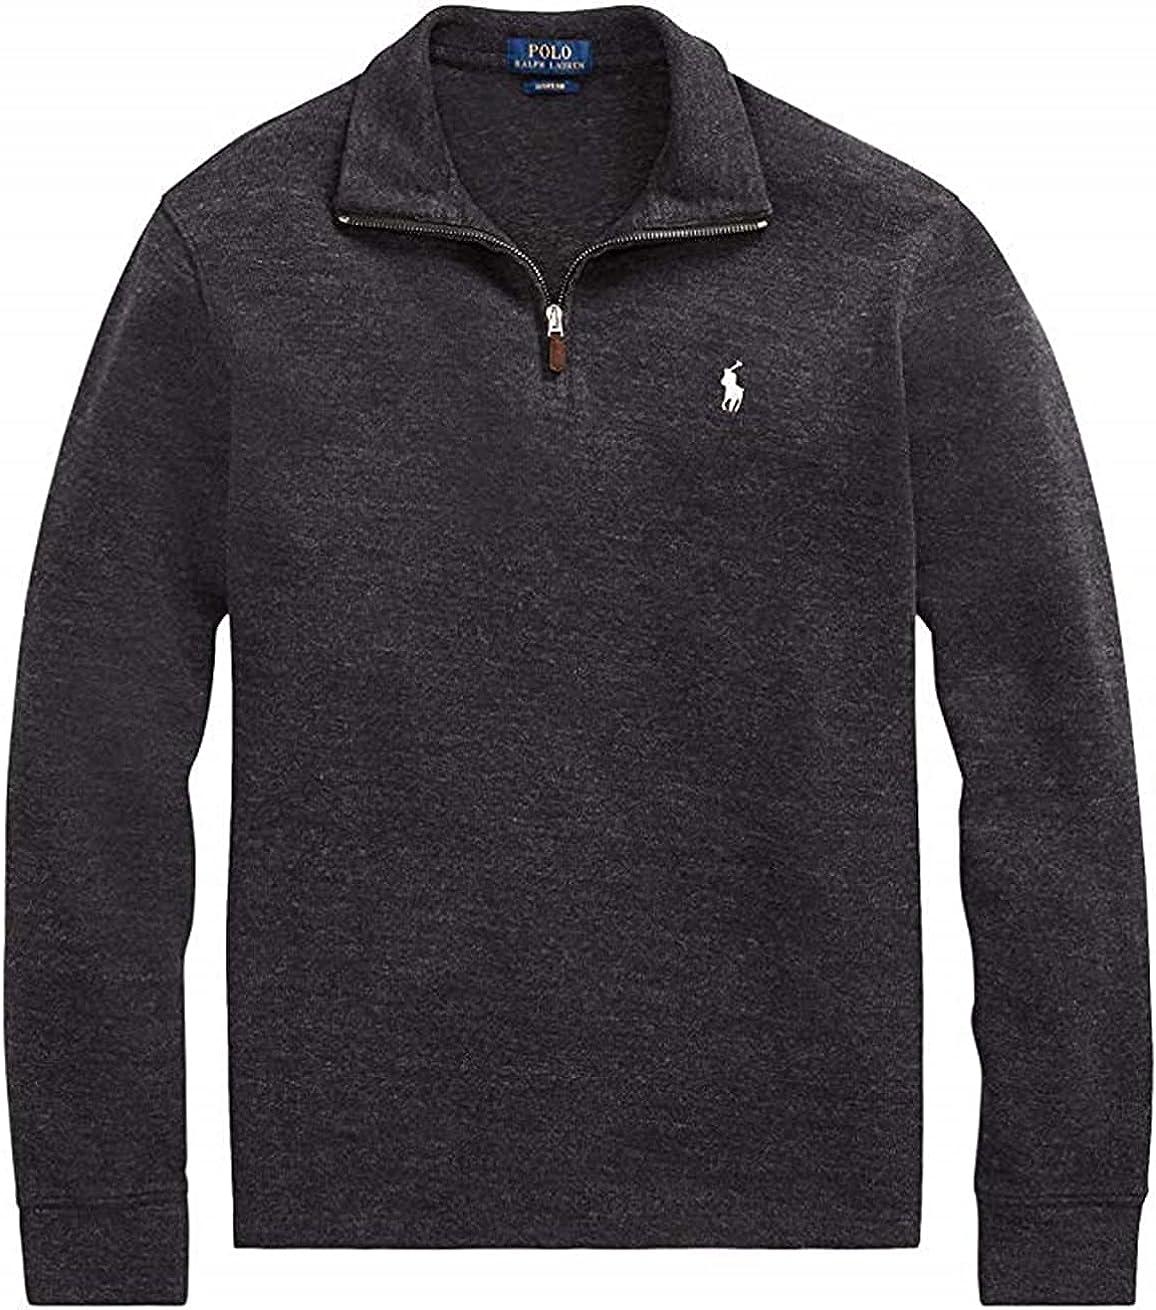 Polo Ralph Lauren mens Pullover